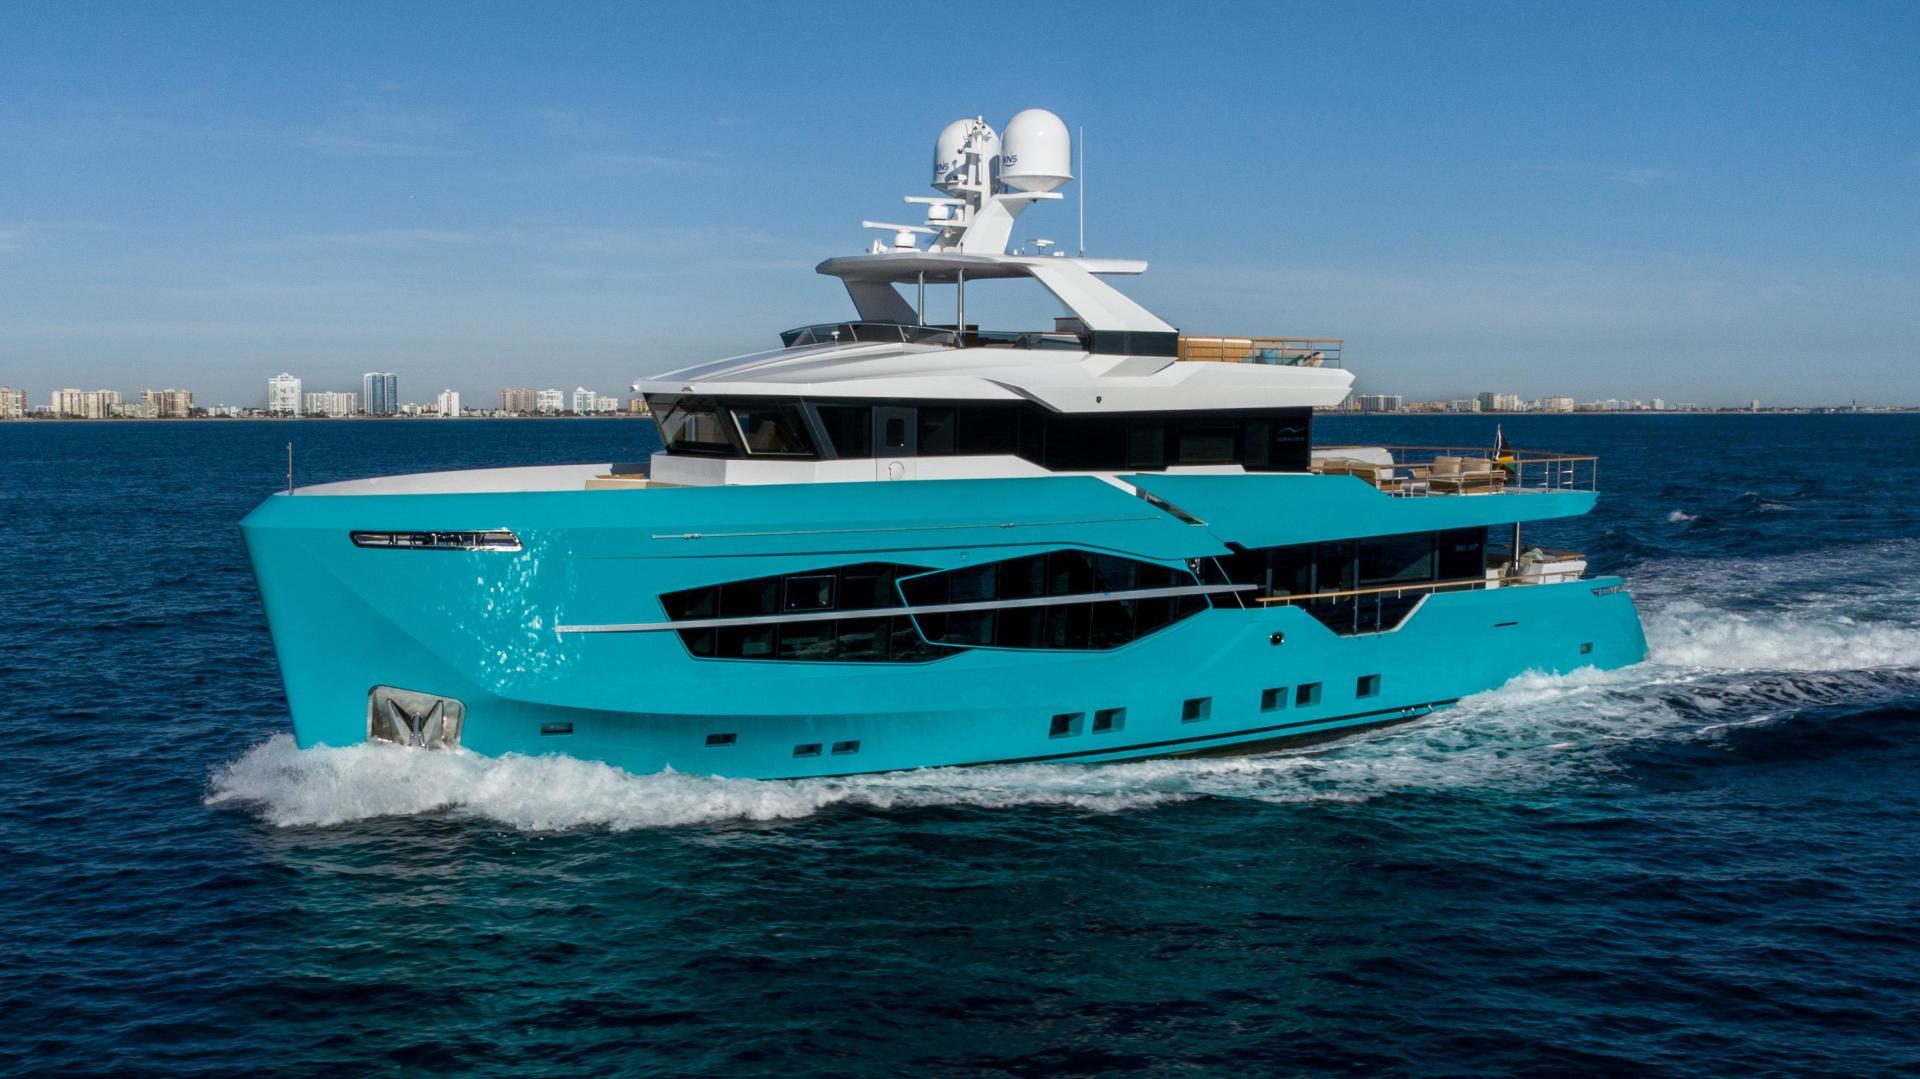 Numarine-32XP 2020-7 Diamonds Fort Lauderdale-Florida-United States-1629373 | Thumbnail